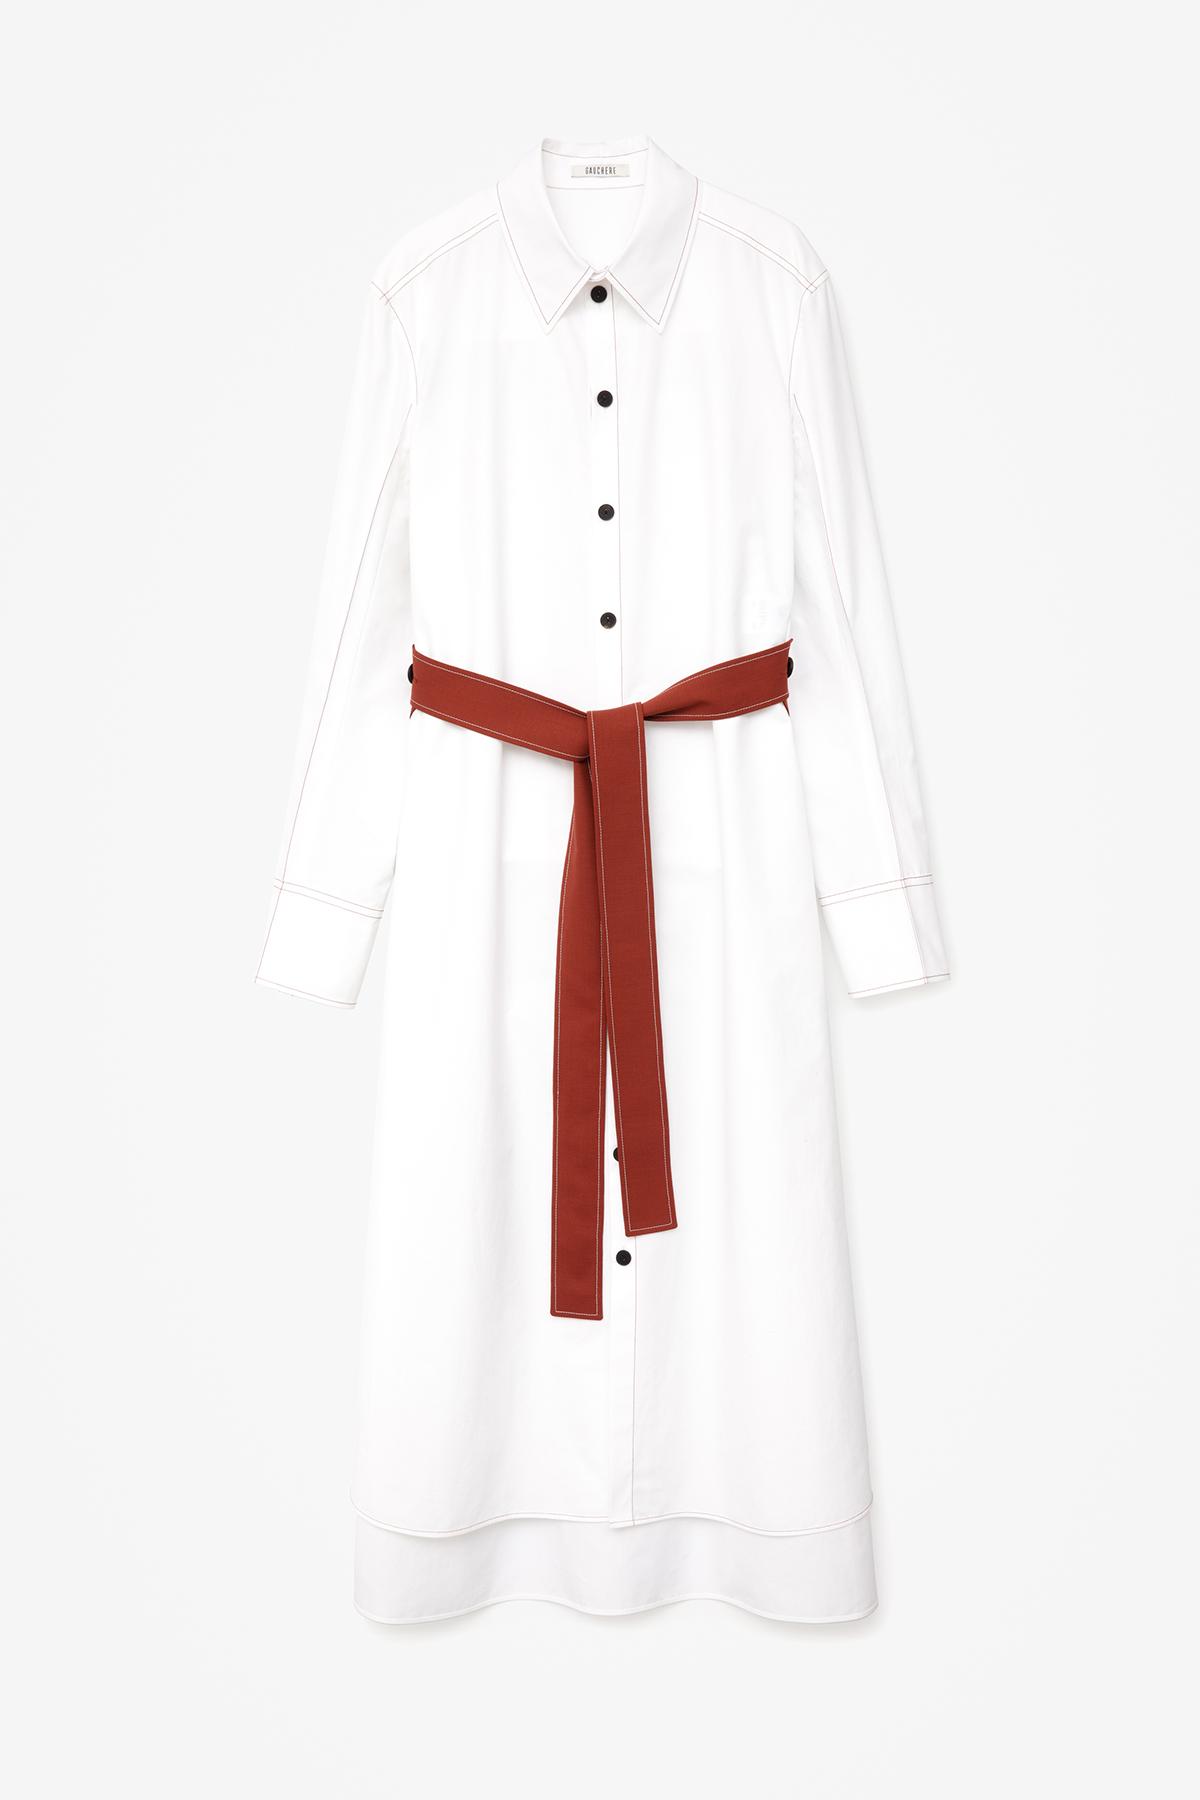 DRESS SYBIL WHITE AND BRICK